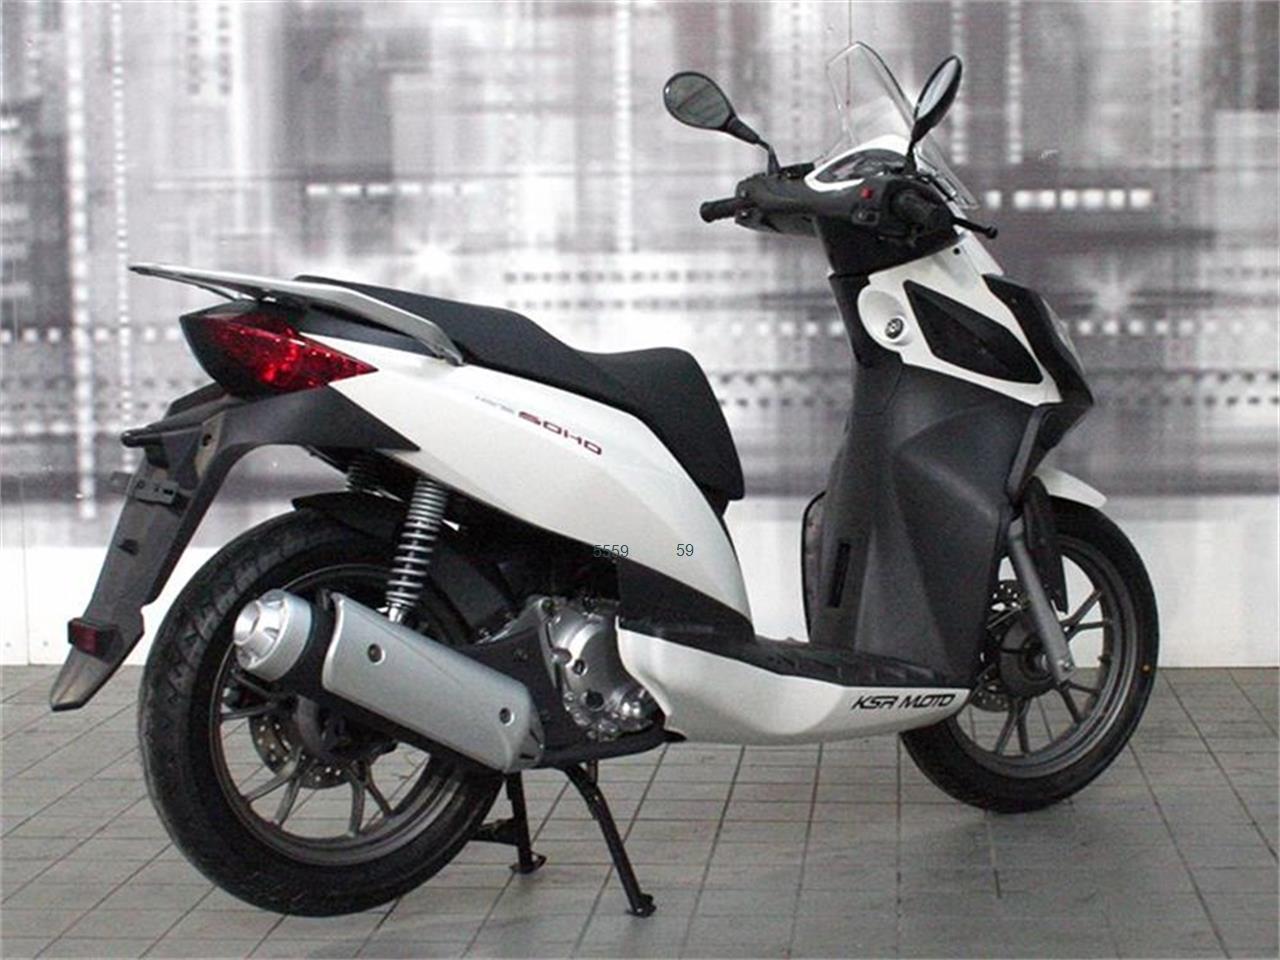 KSR MOTO SOHO 125_2 de venta en Barcelona